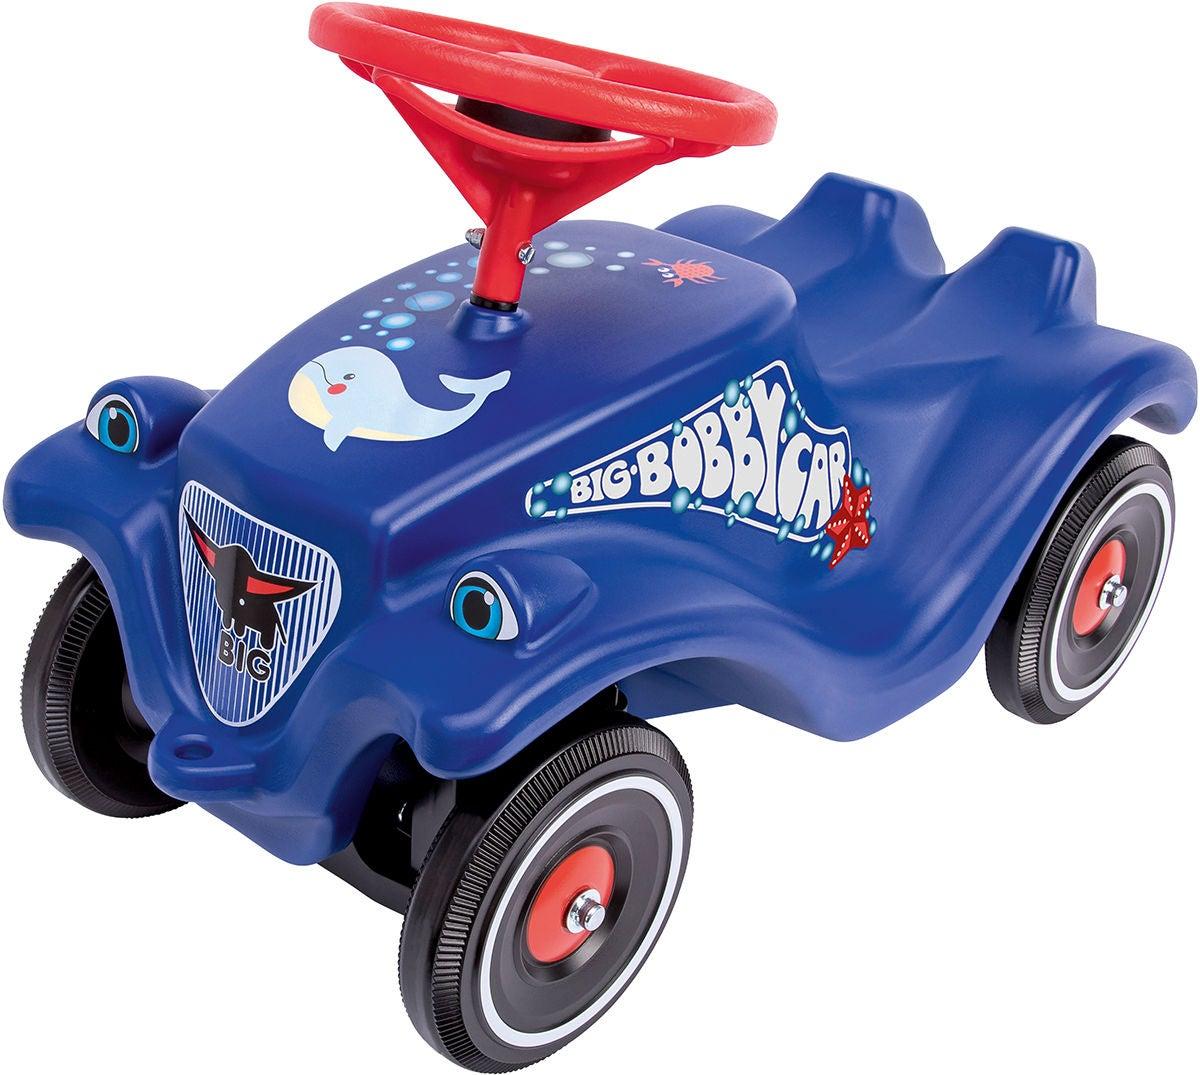 BIG Bobby Car Classic Ocean